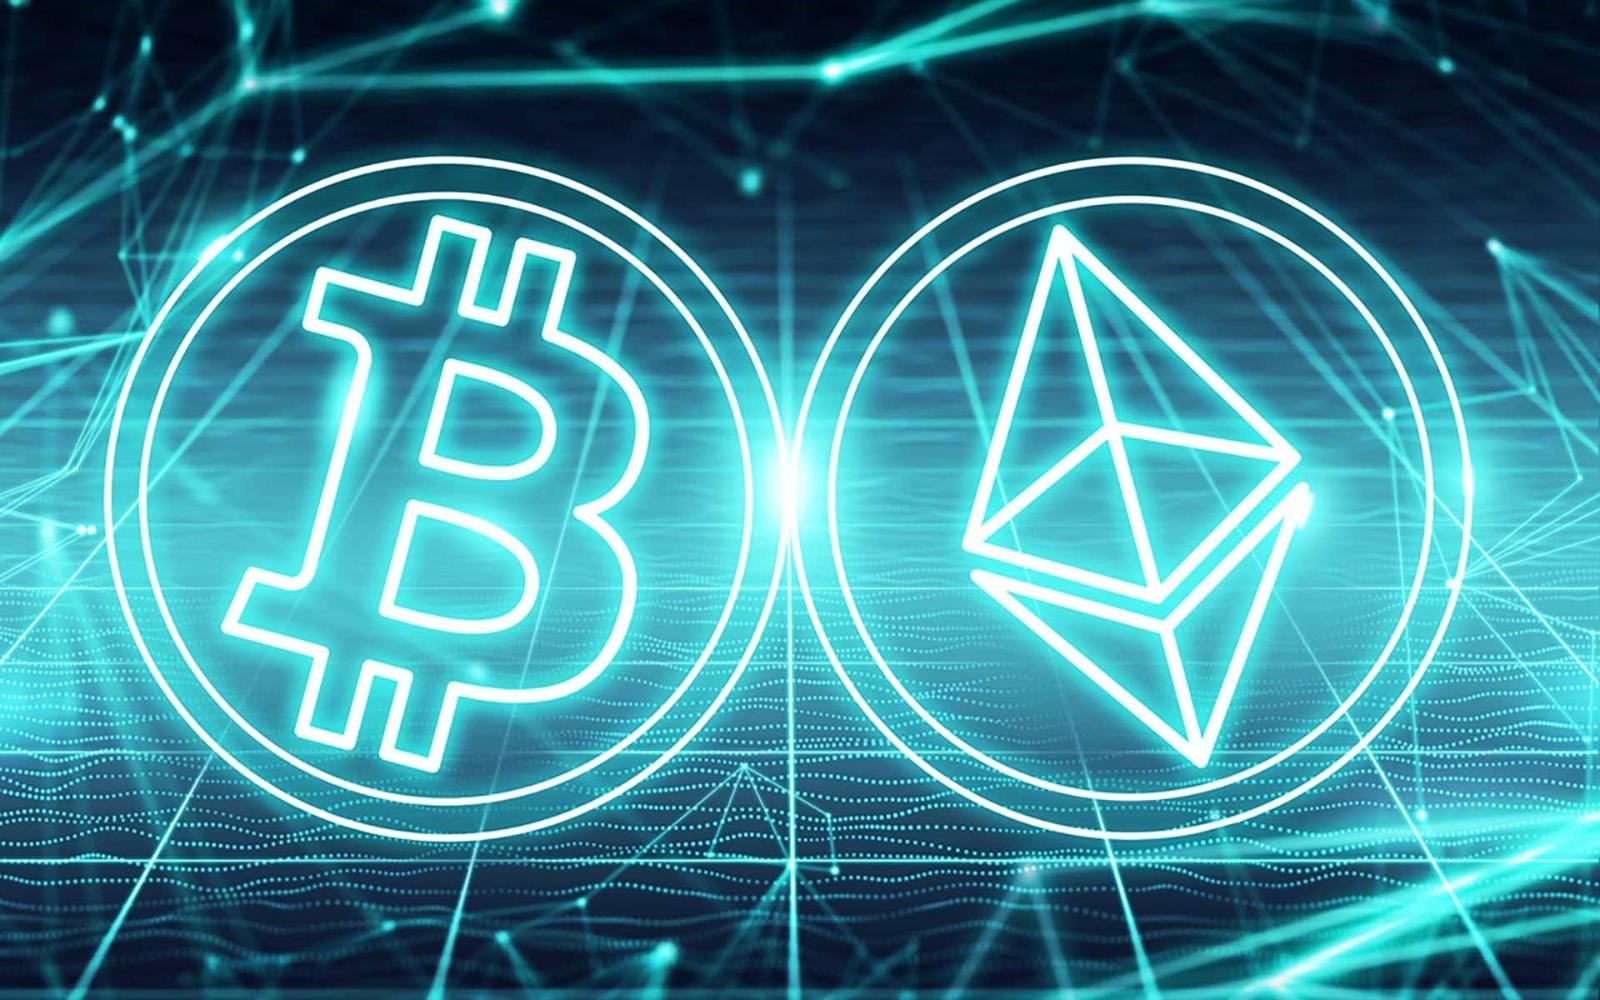 ss bitcoin ethereum - Bitcoin и Ethereum снова в тренде?